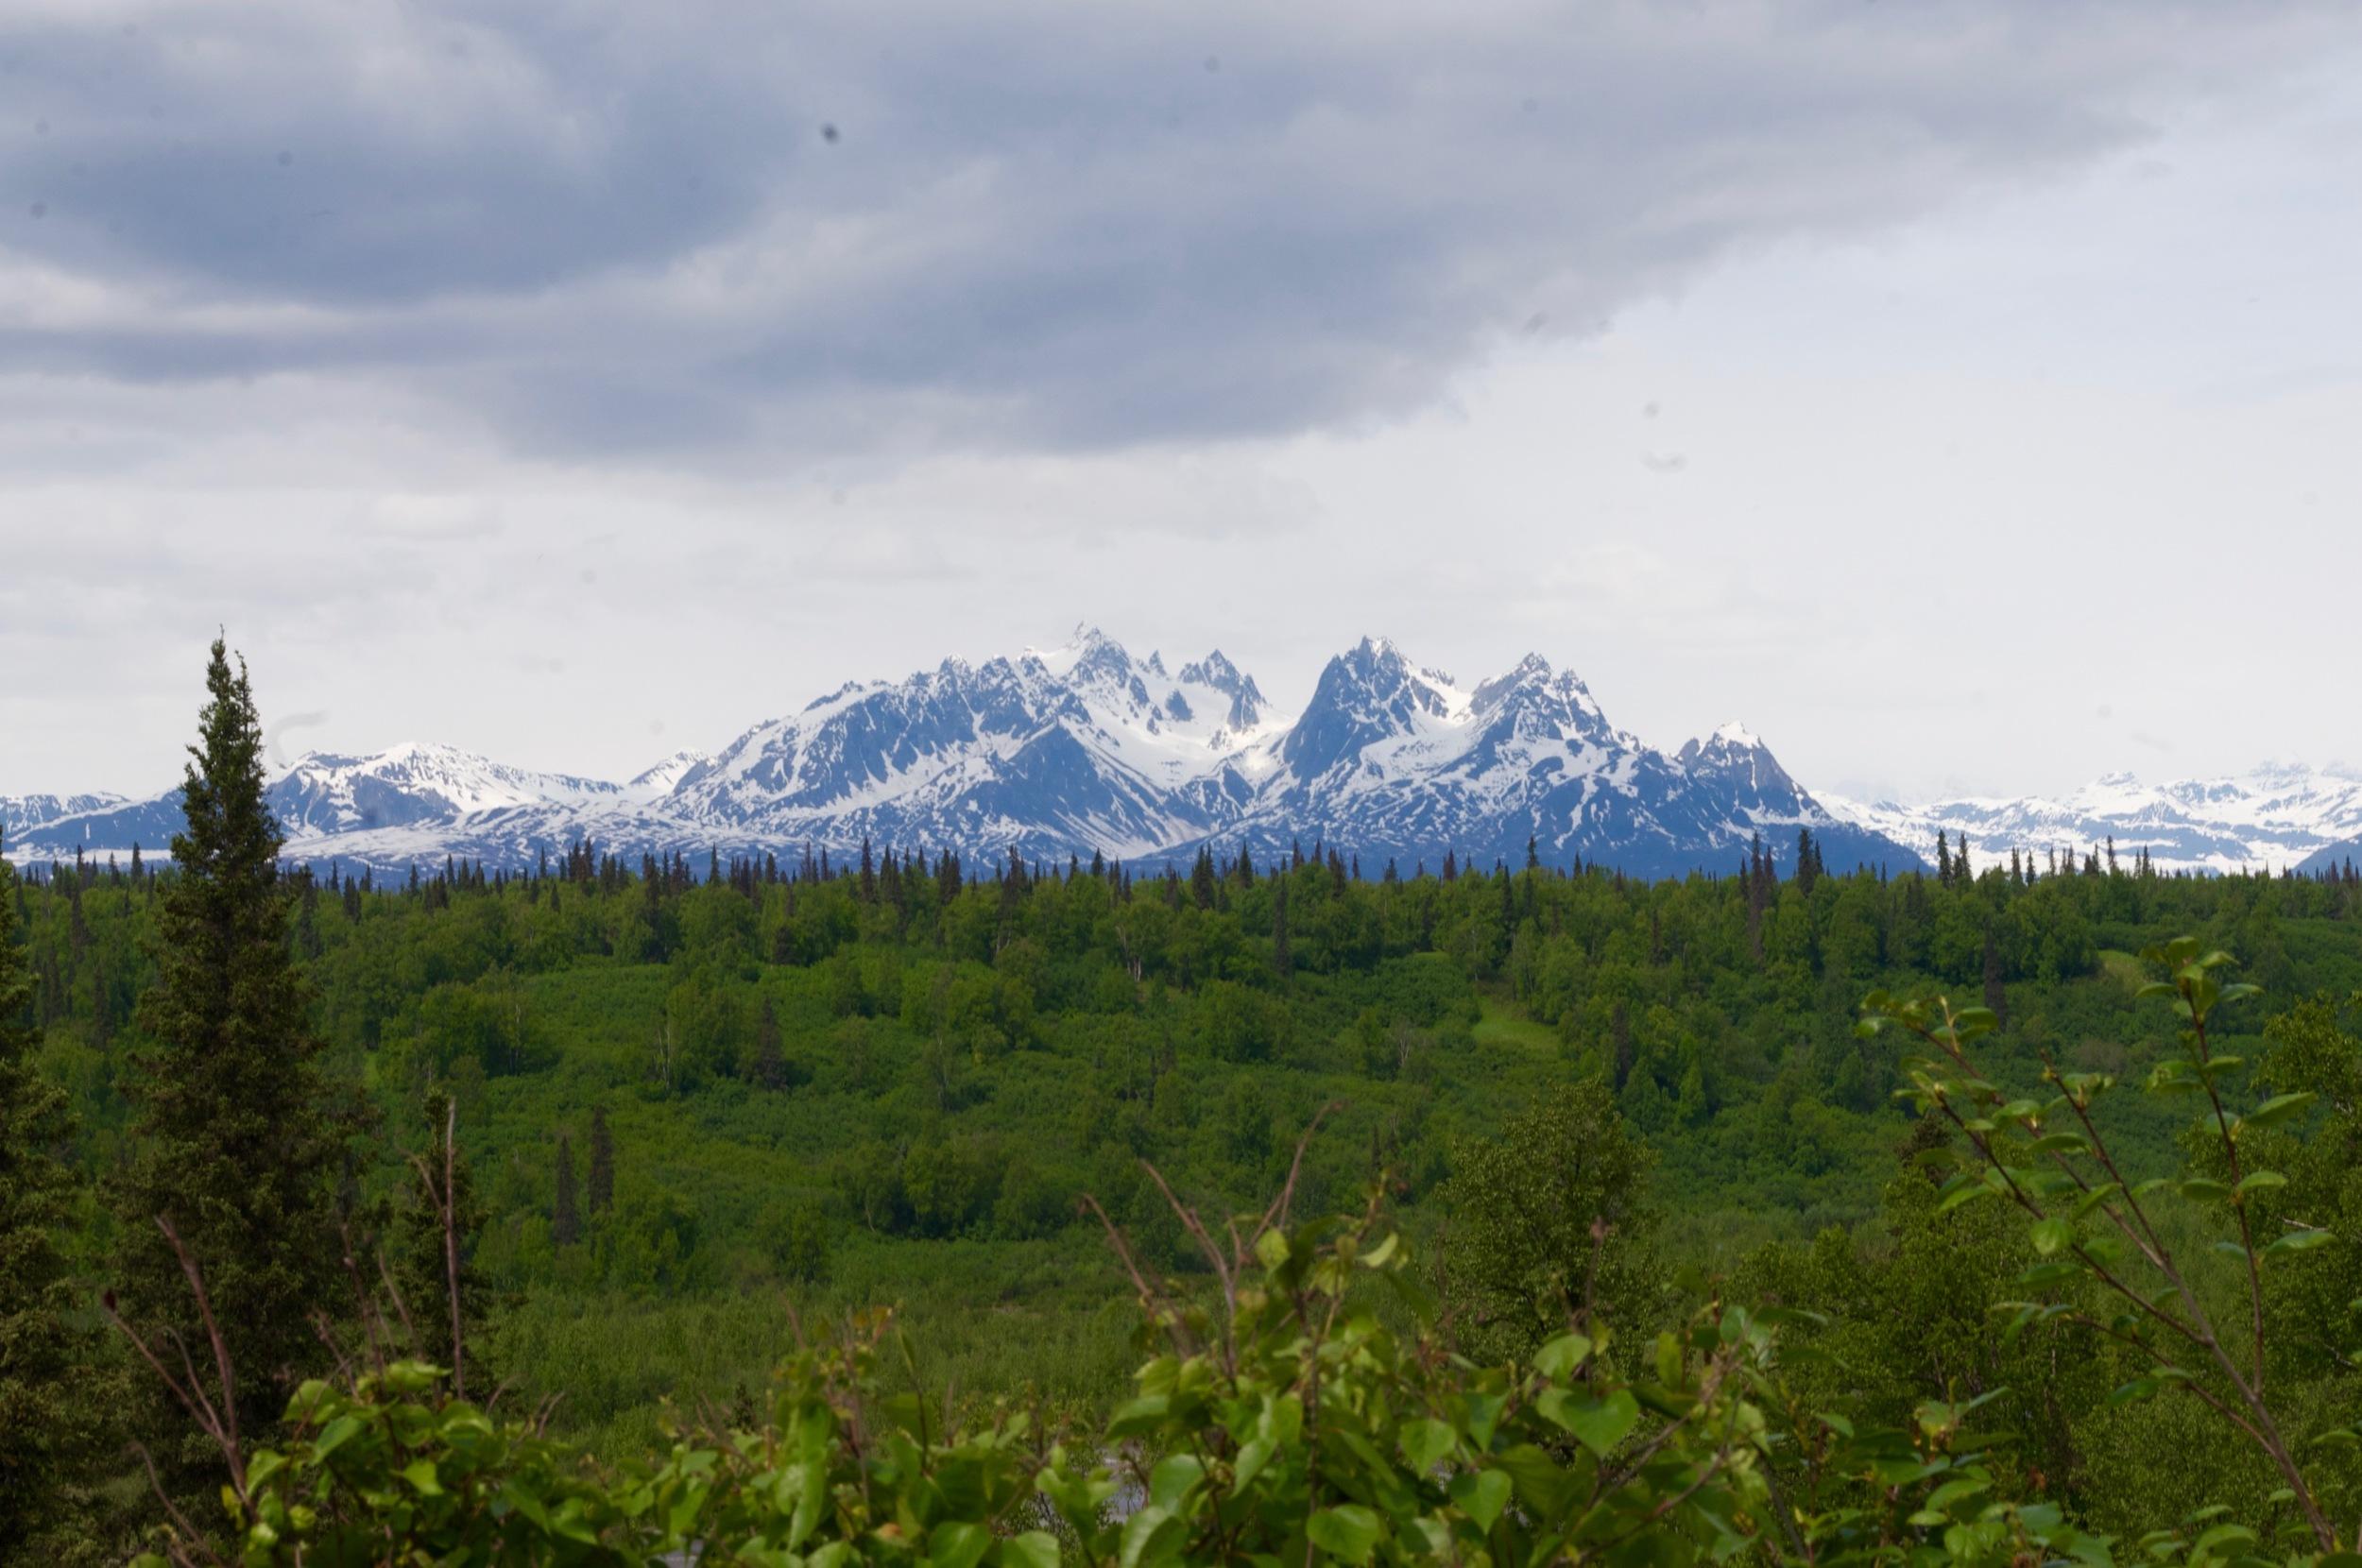 Denali! The highest mountain peak in North America.